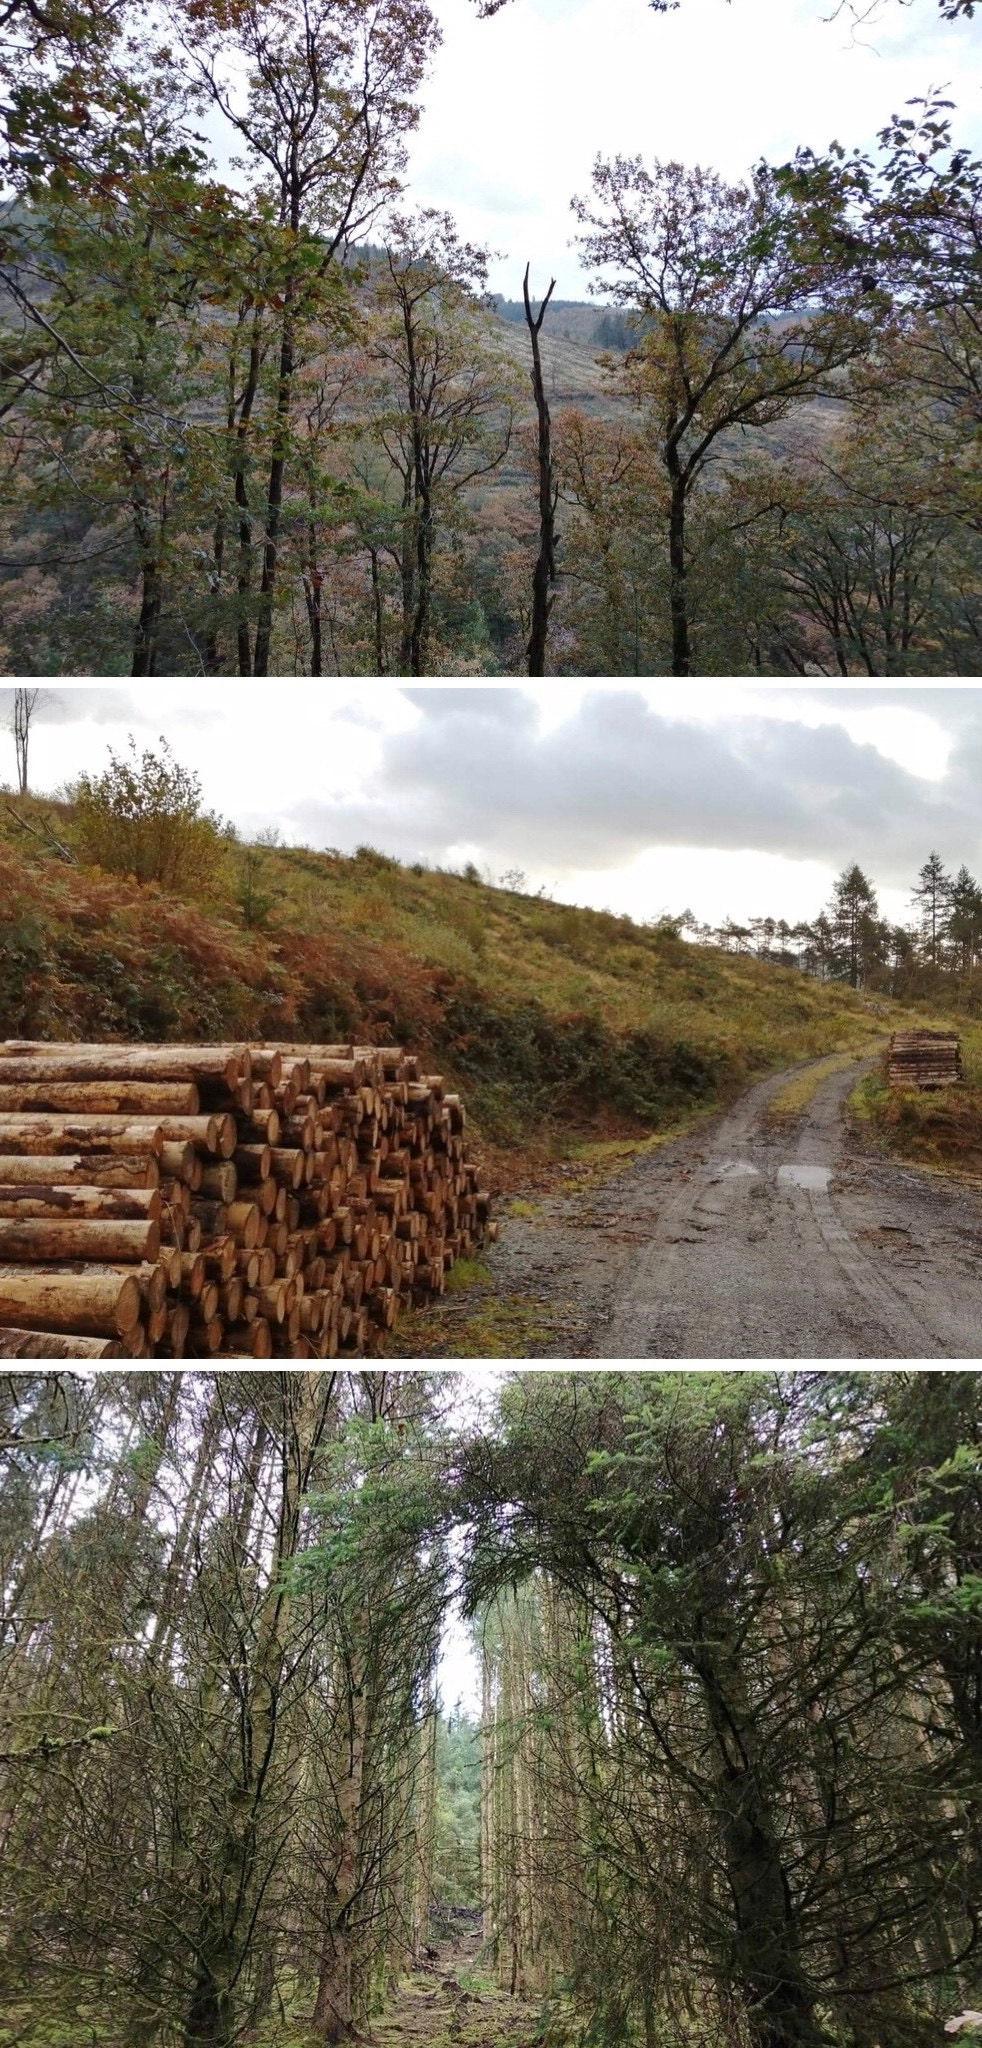 Woodland management in Abergorlech, Carmarthenshire, Wales